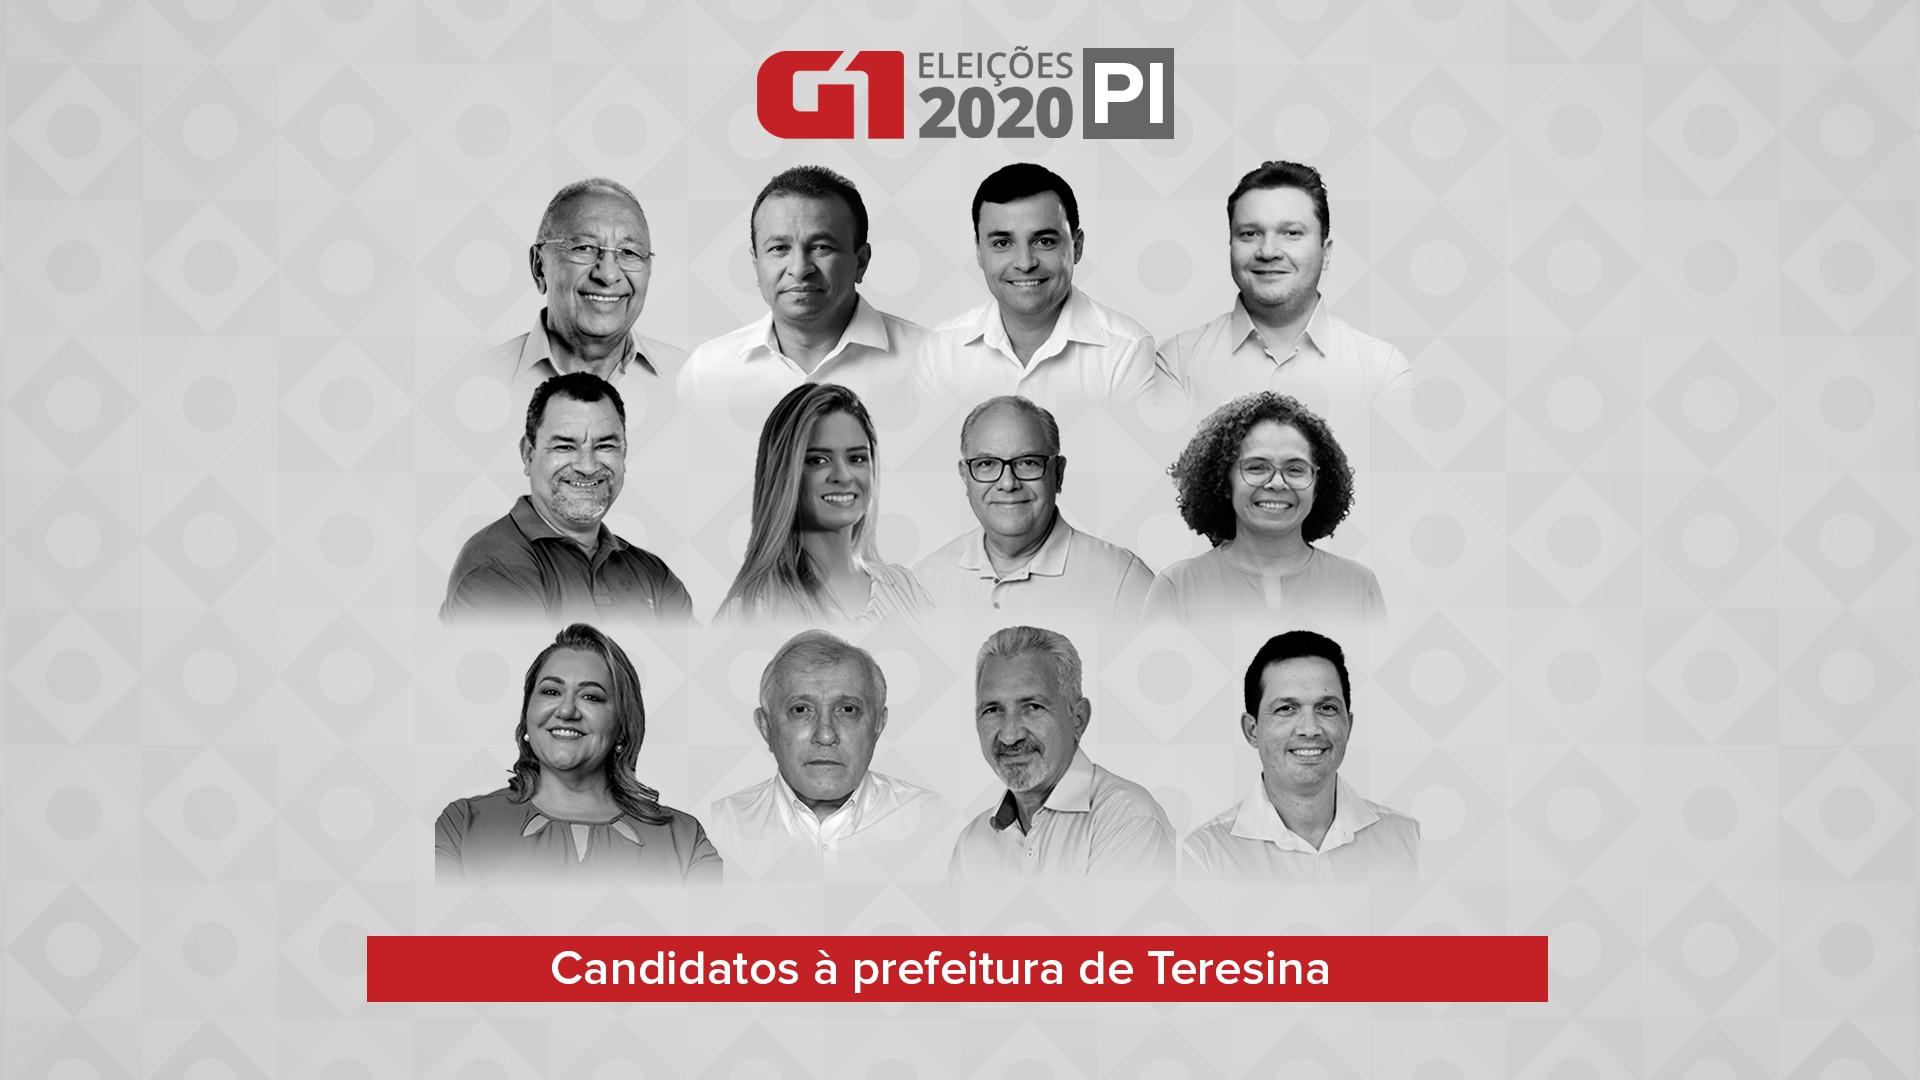 Eleições 2020: confira a agenda dos candidatos a prefeito de Teresina nesta quinta-feira (29)